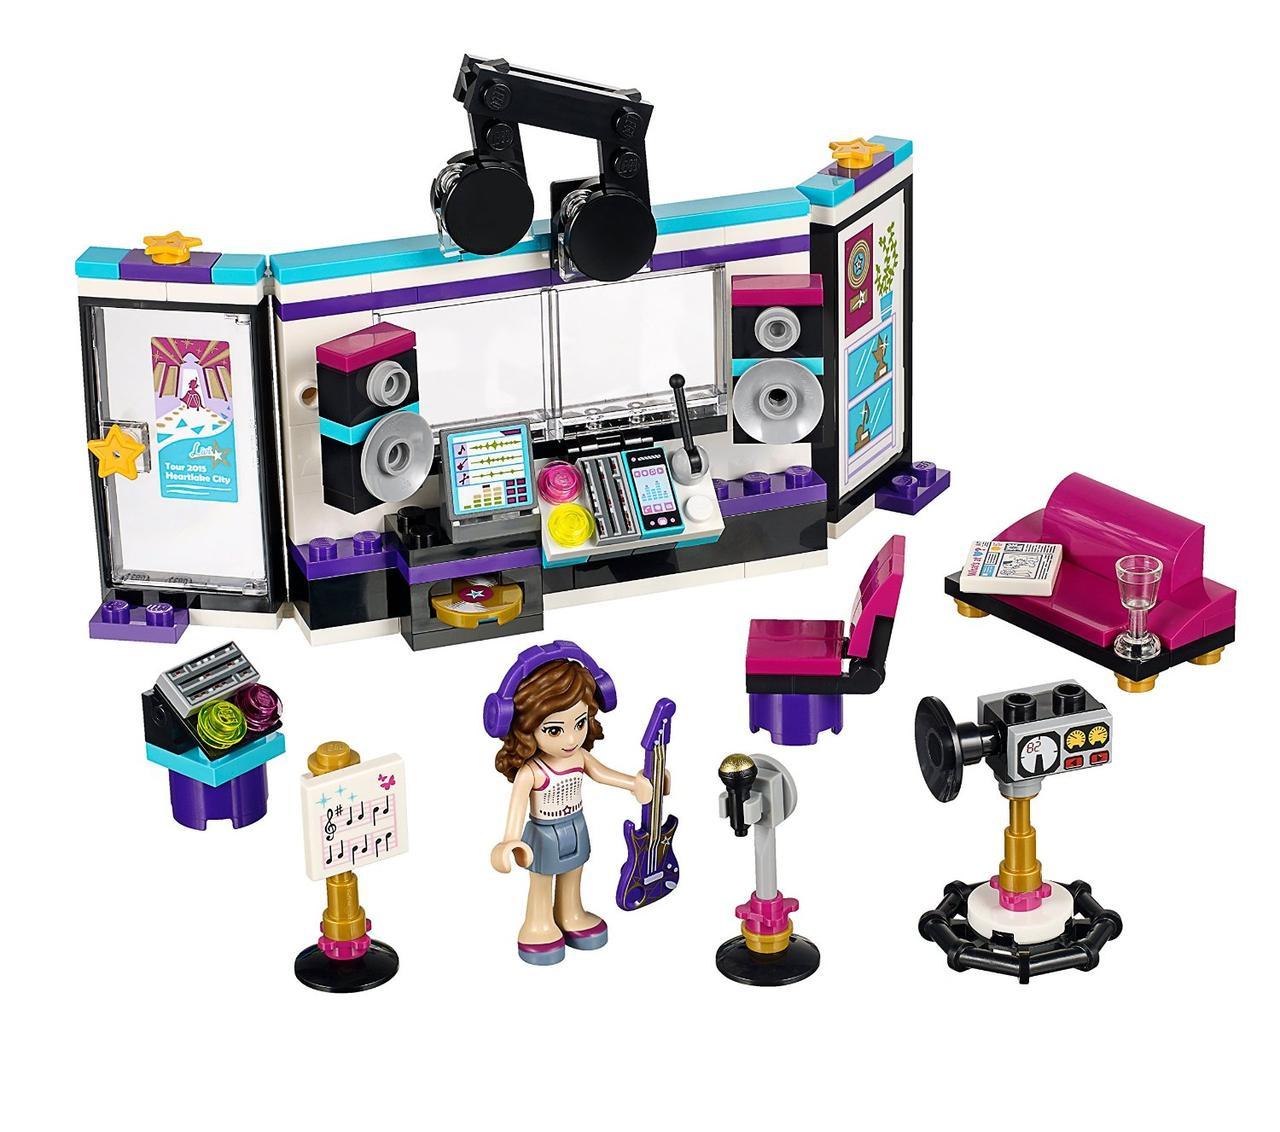 LEGO Friends Поп-звезда в студии звукозаписи Pop Star Recording Studio 41103